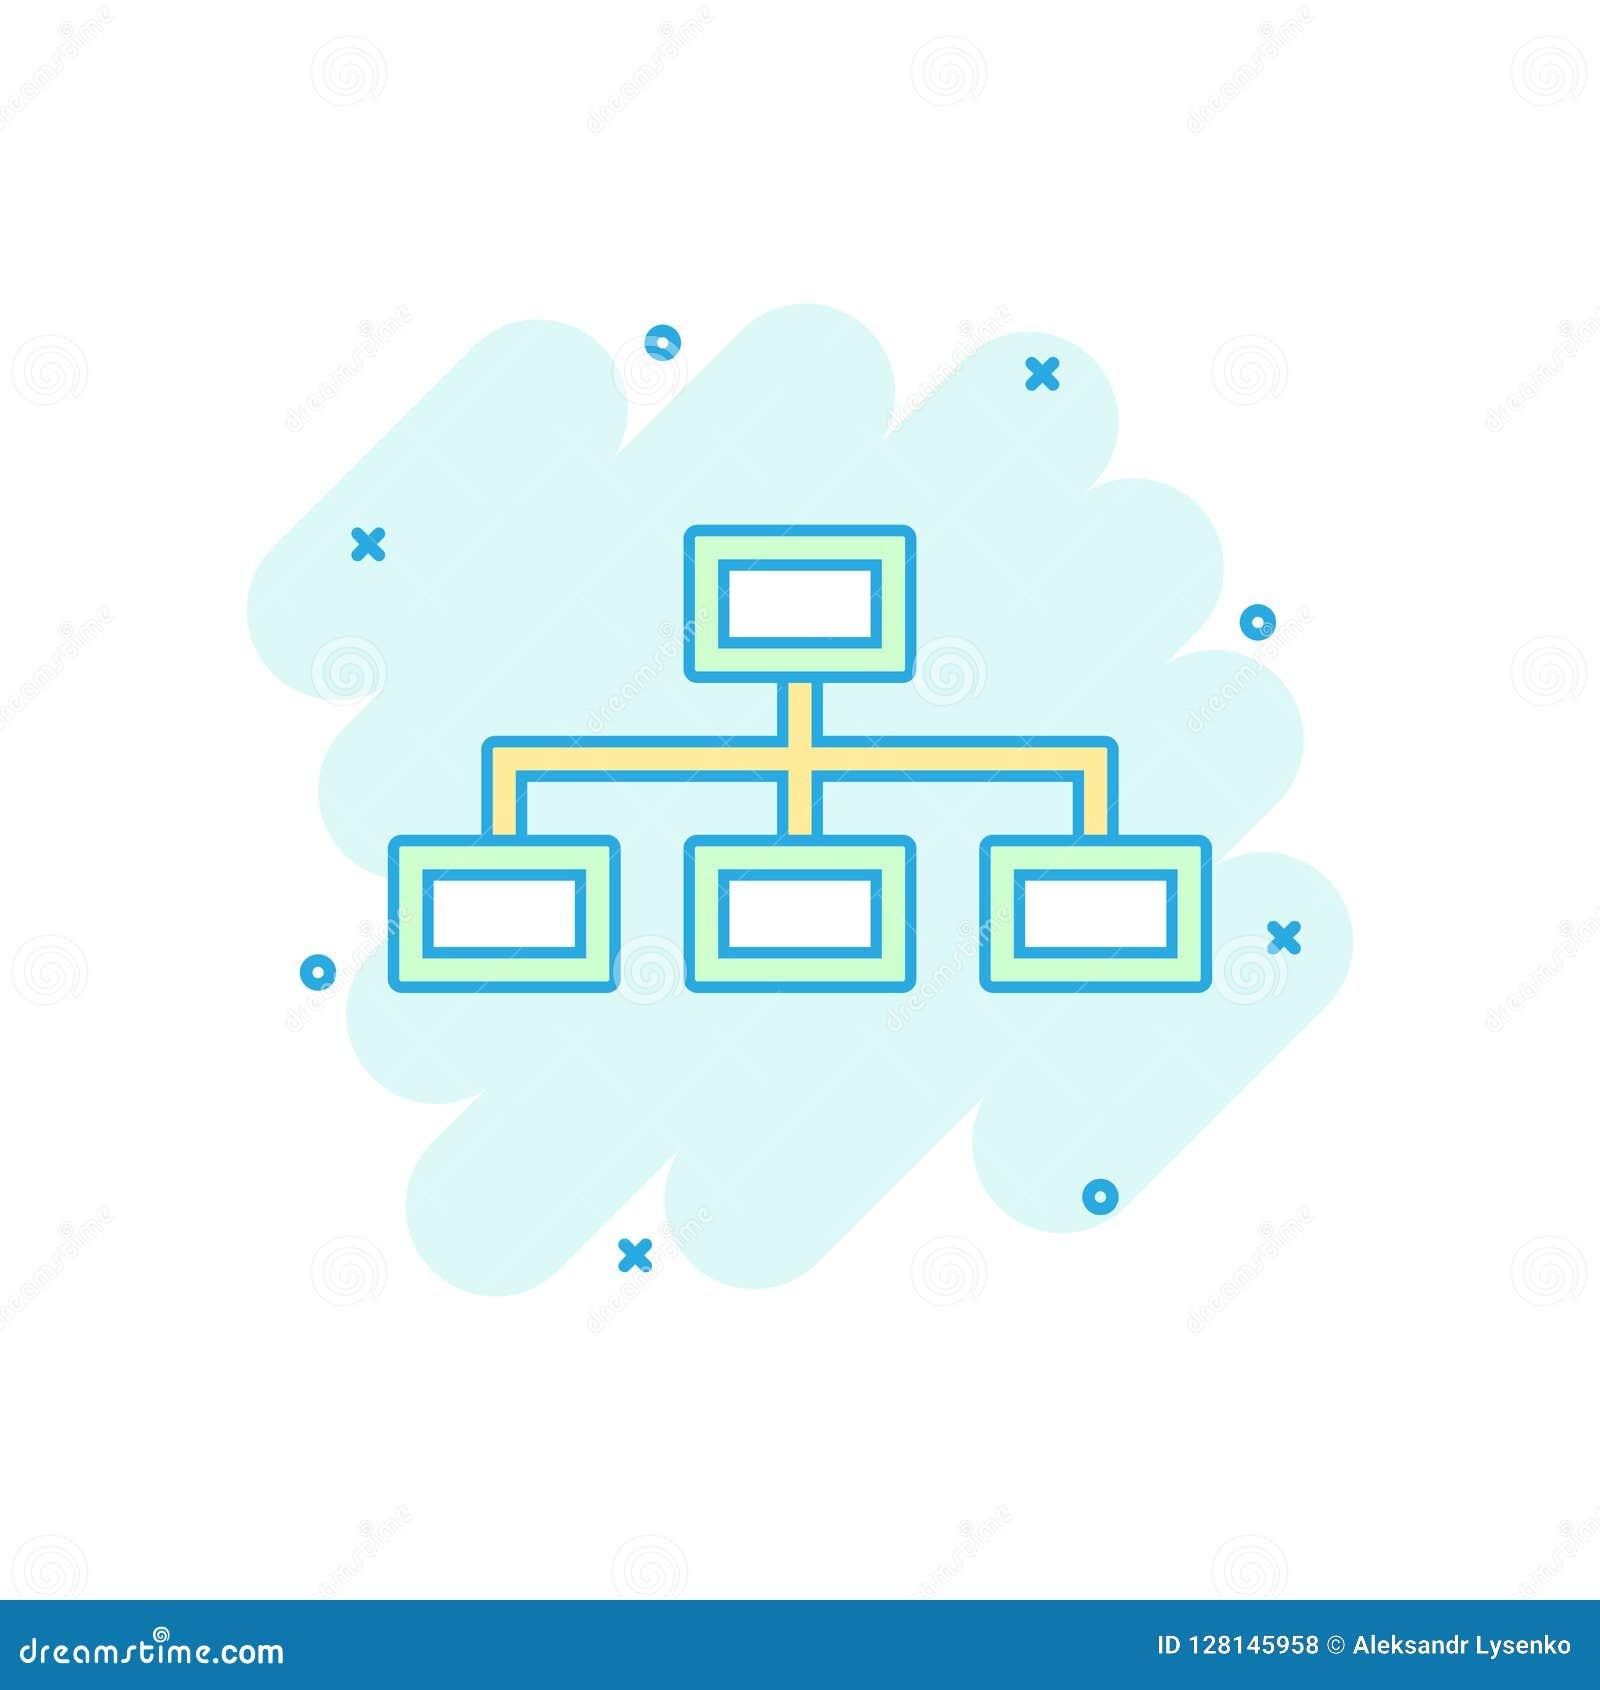 vector cartoon structure diagram icon comic style chart orga organization sign illustration pictogram business splash effect 128145958 cartoon structure diagram just another wiring diagram blog \u2022